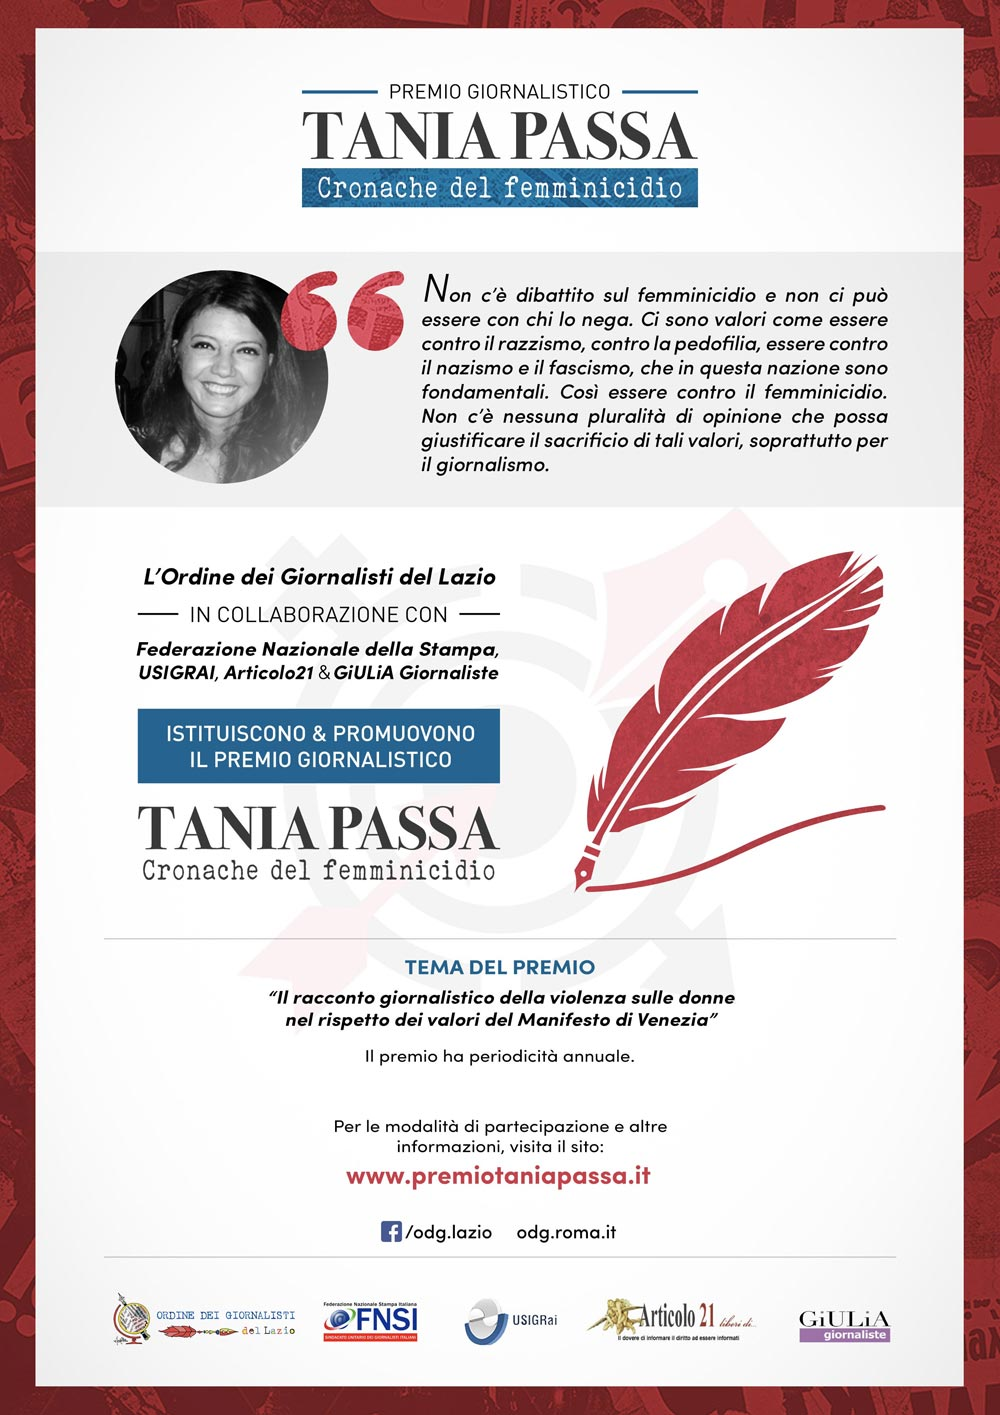 tania_passa_premio